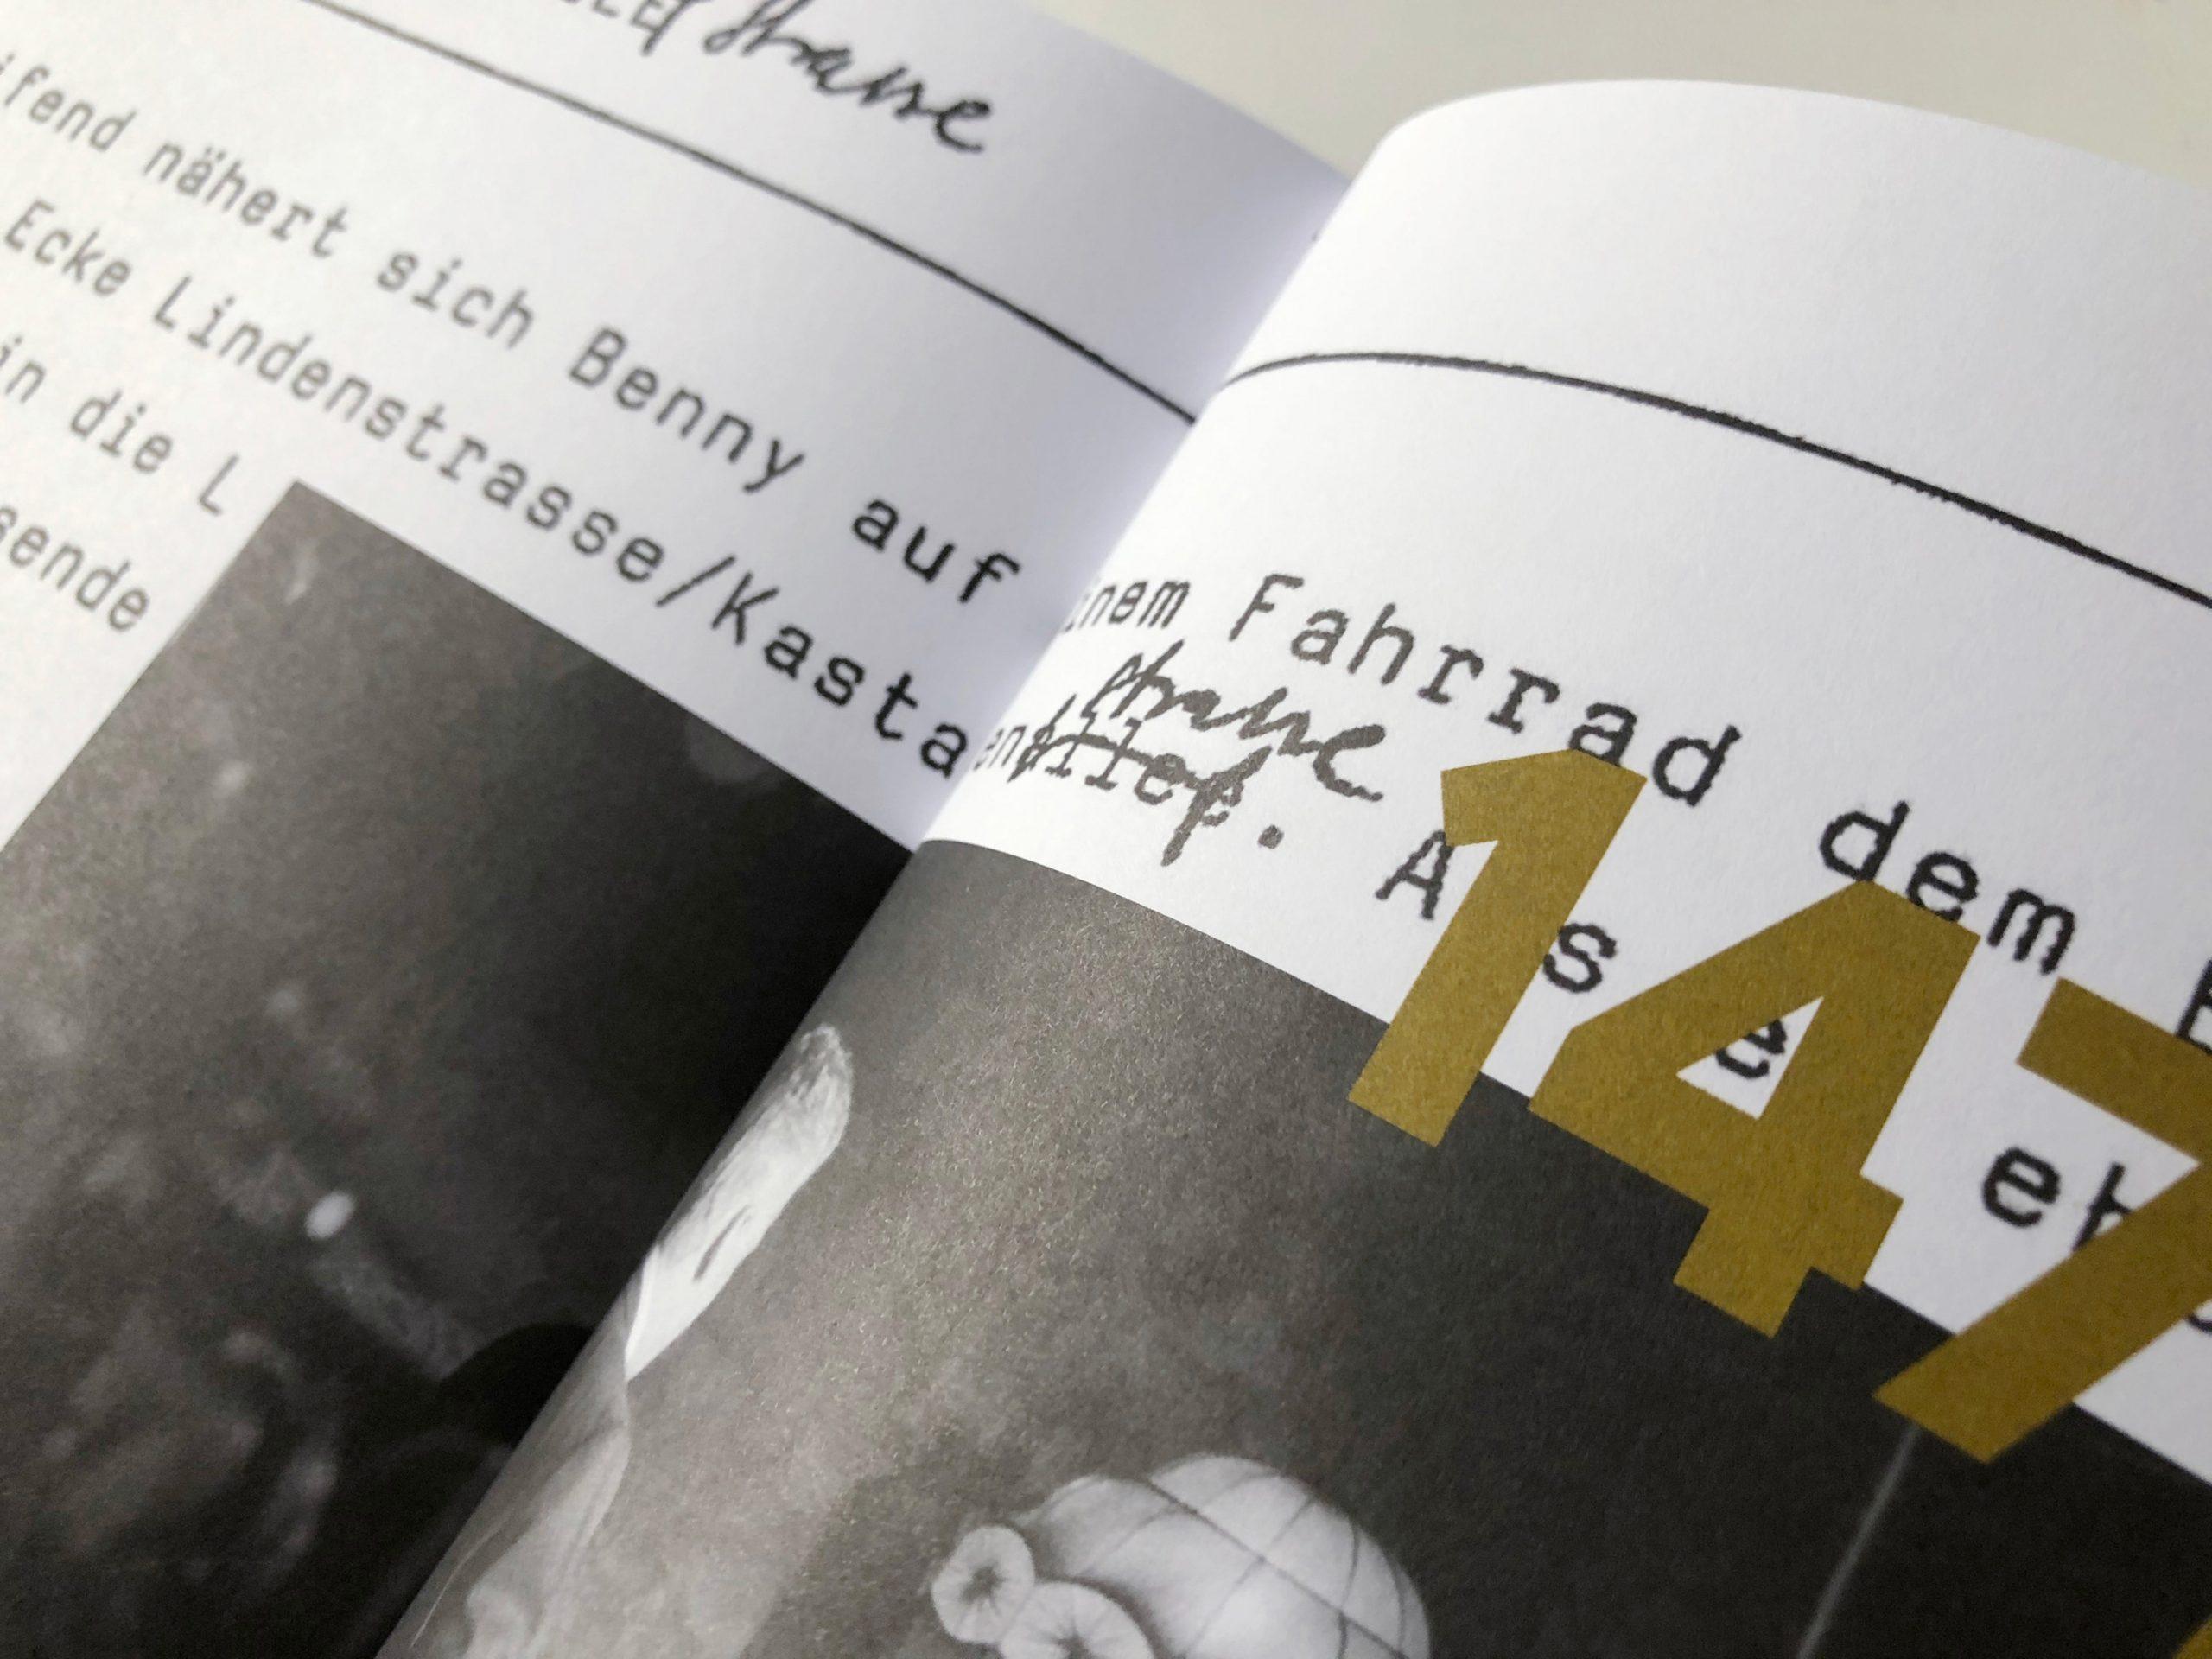 editorial-design-lindenstrasse-11